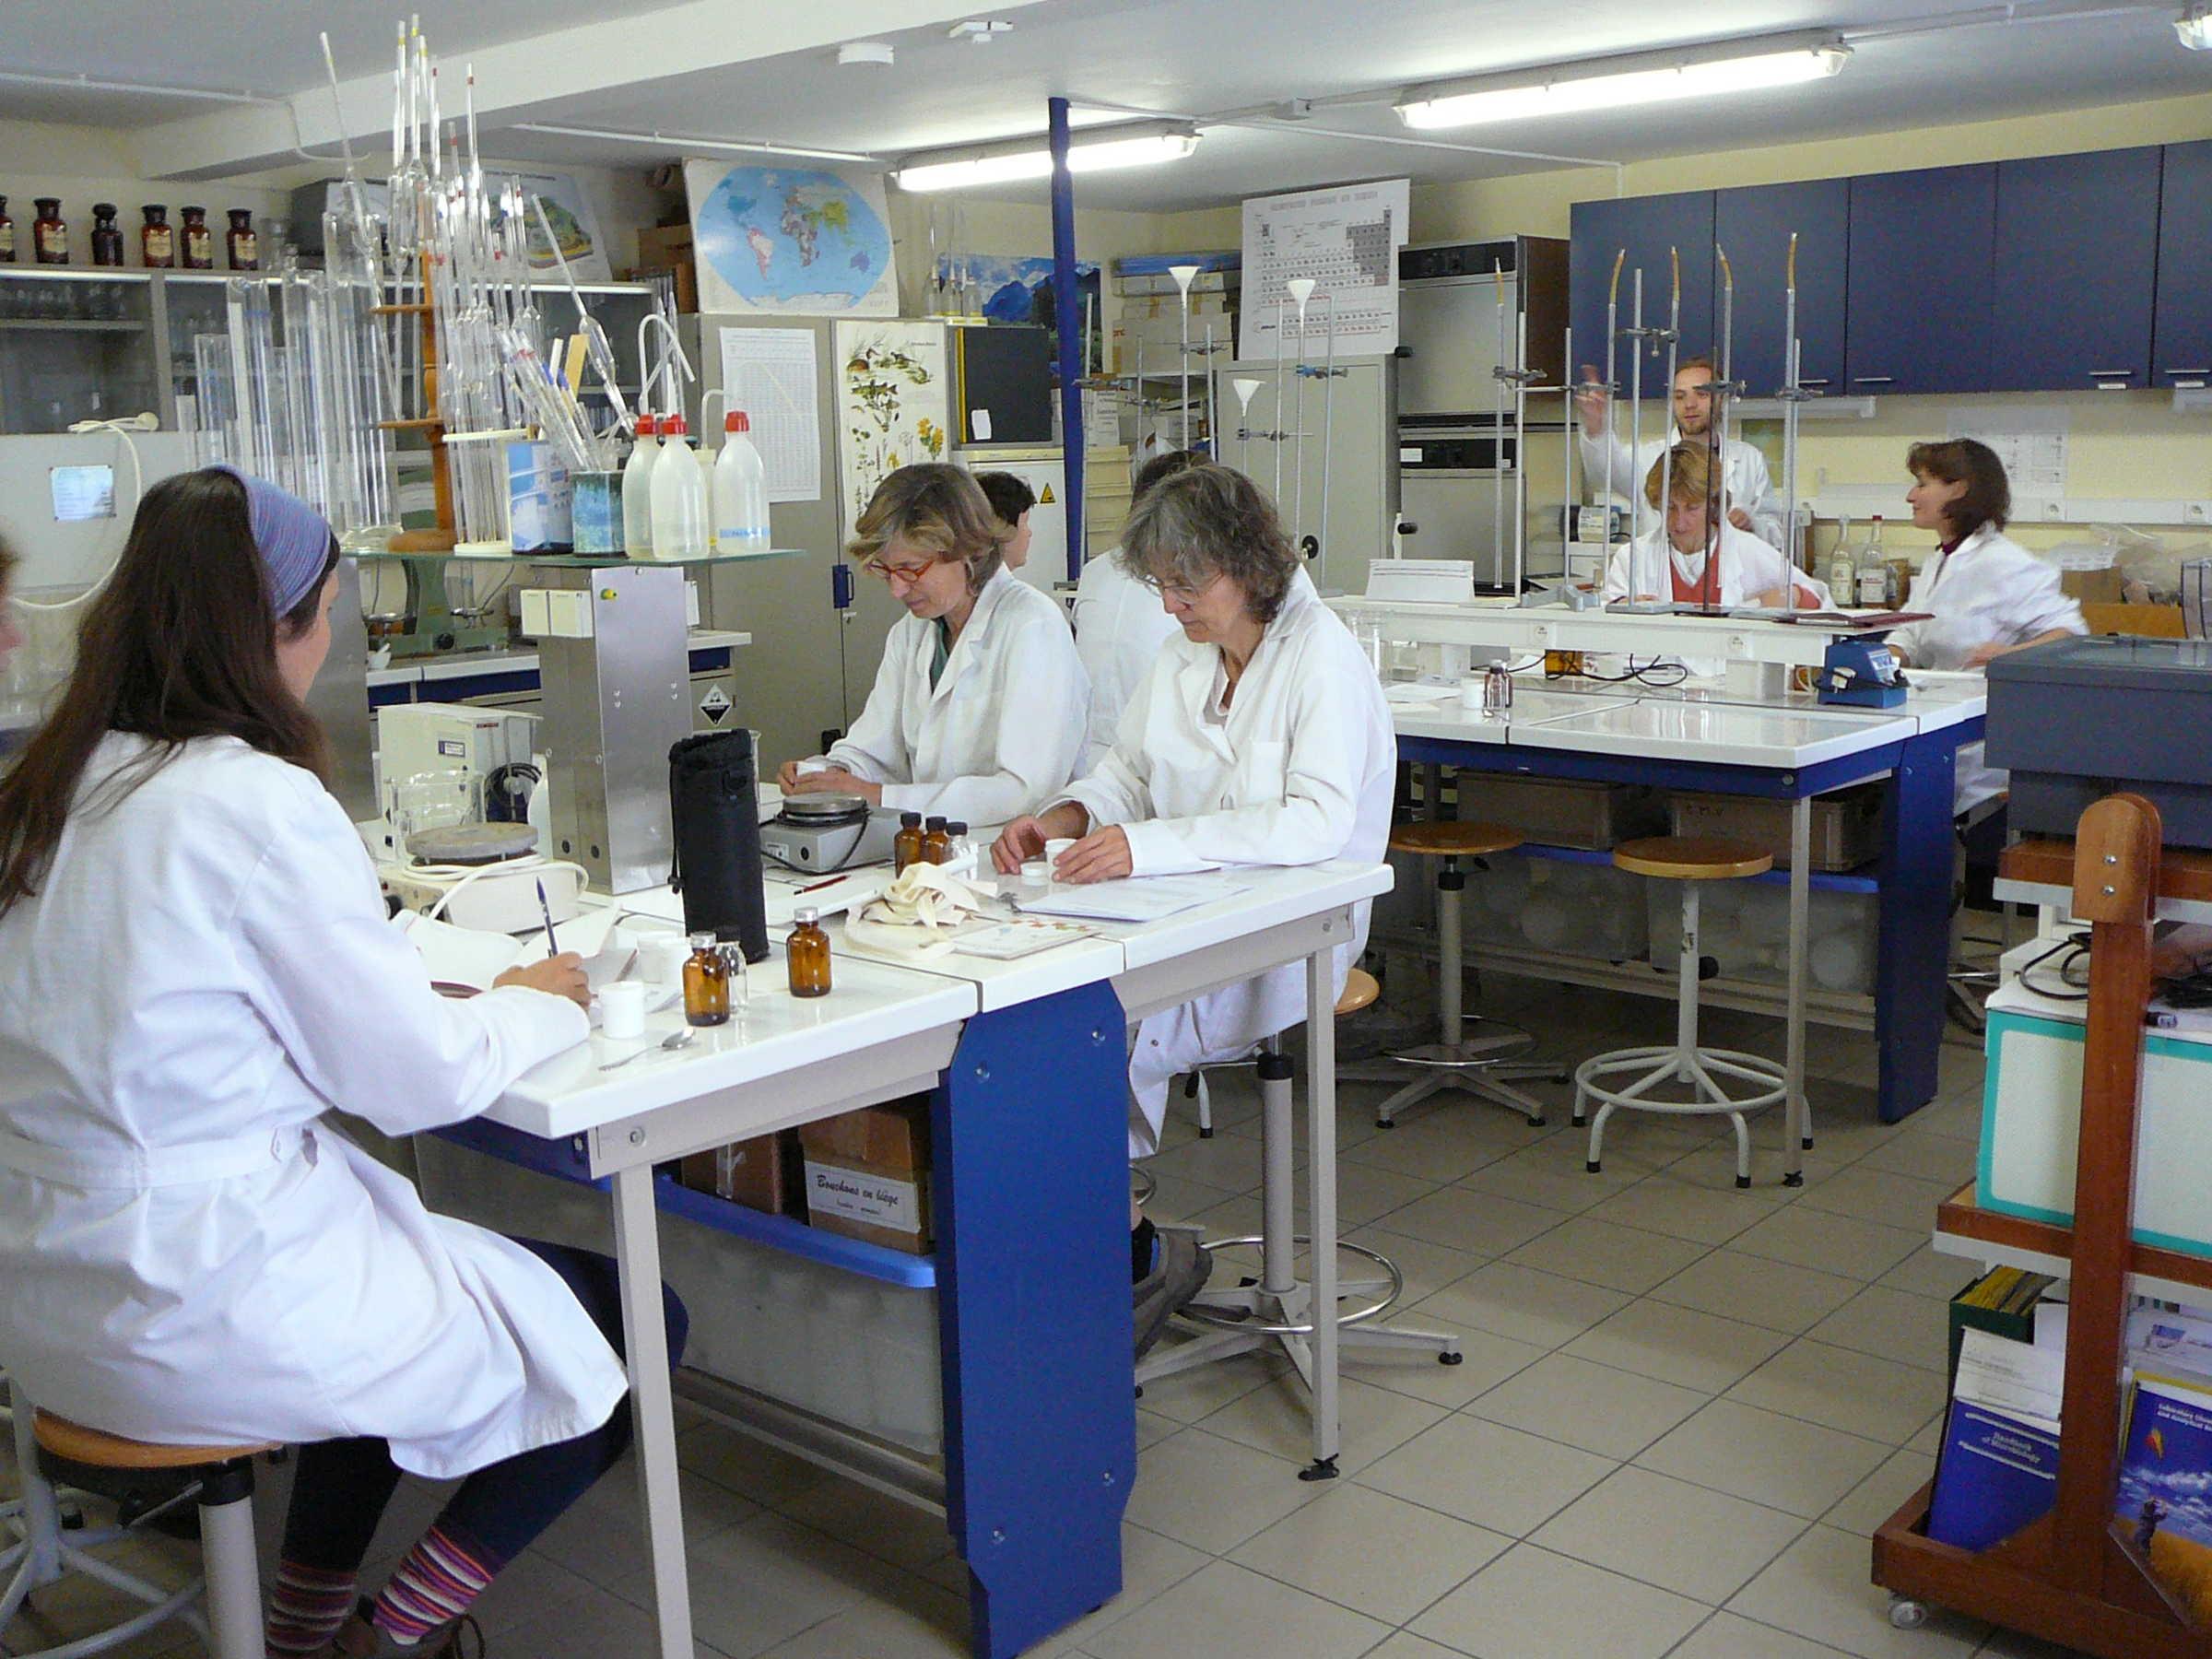 Labaratoire chimie